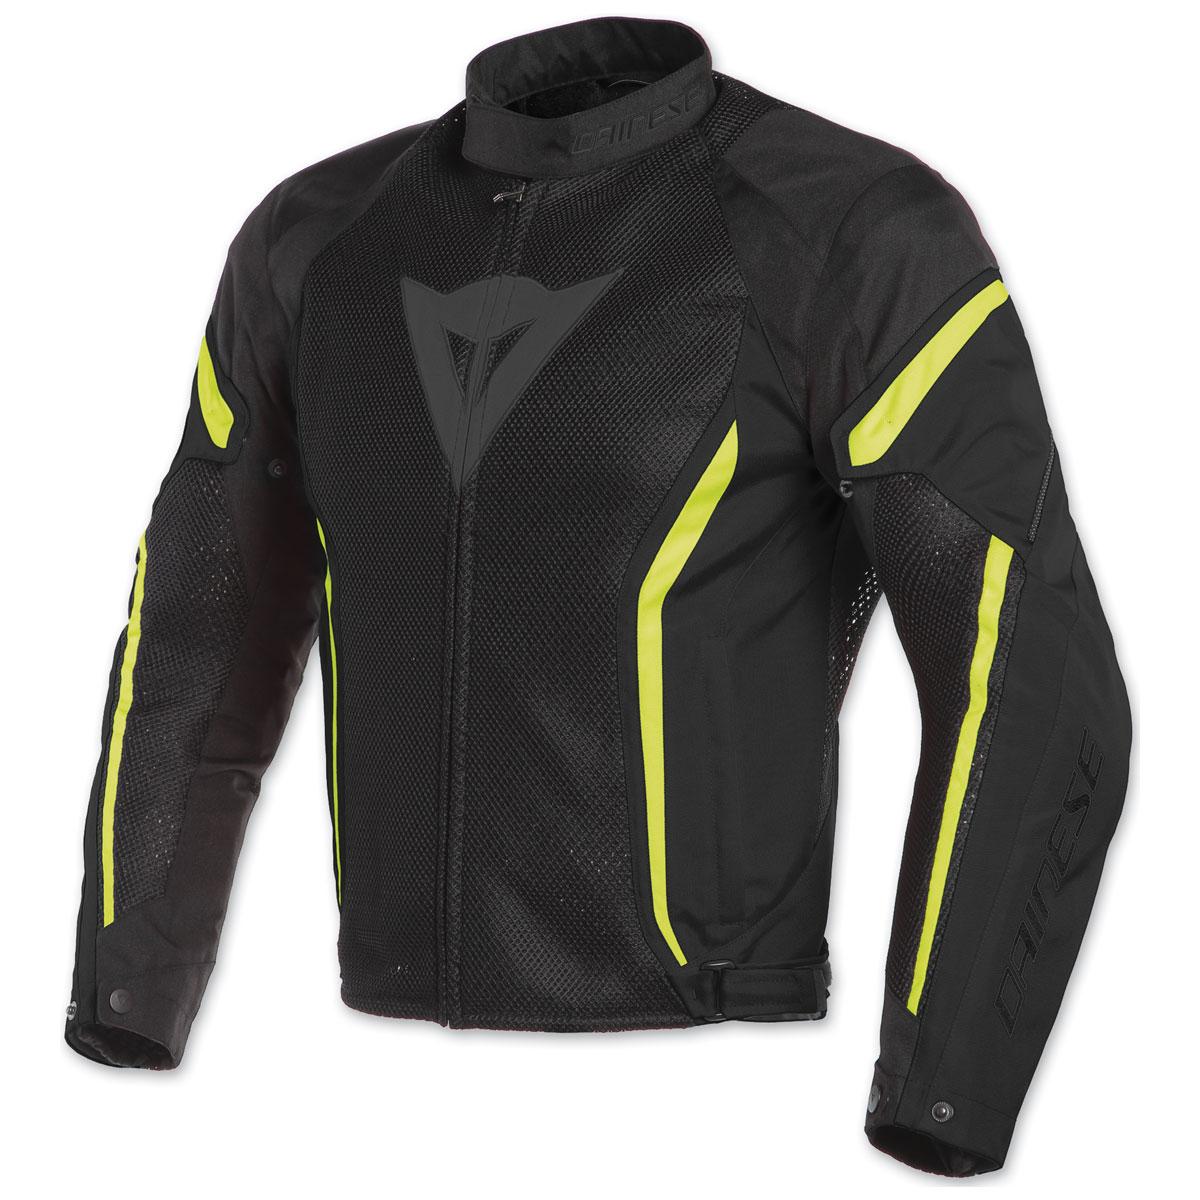 Dainese Men's Air Crono 2 Black/Black/Fluo Yellow Textile Jacket